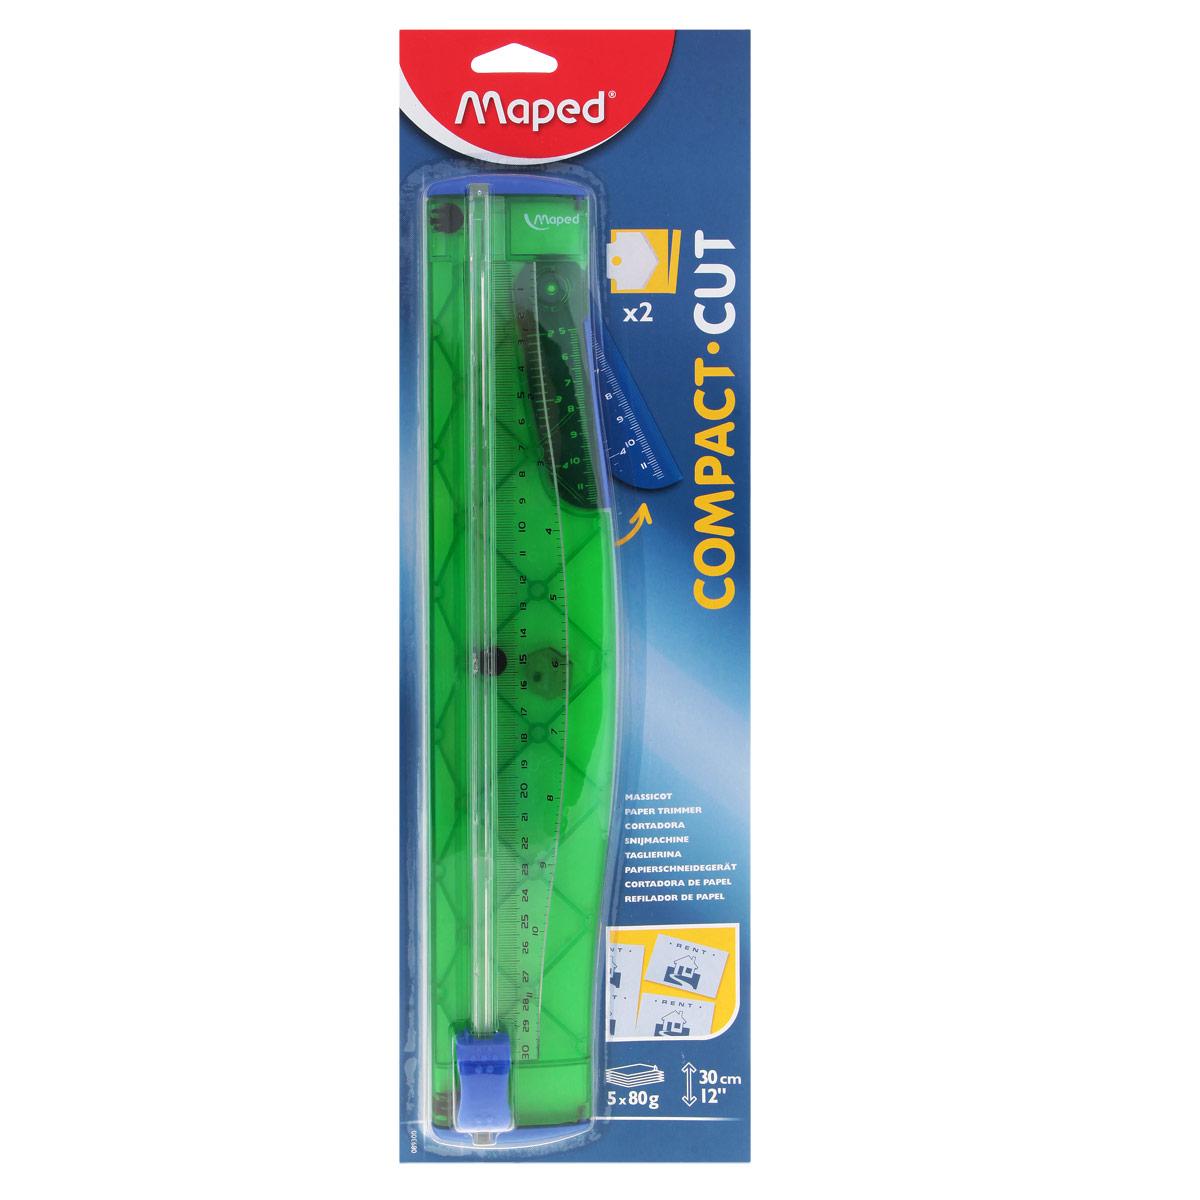 Мини-резак для бумаги Maped  Compact , цвет: зеленый